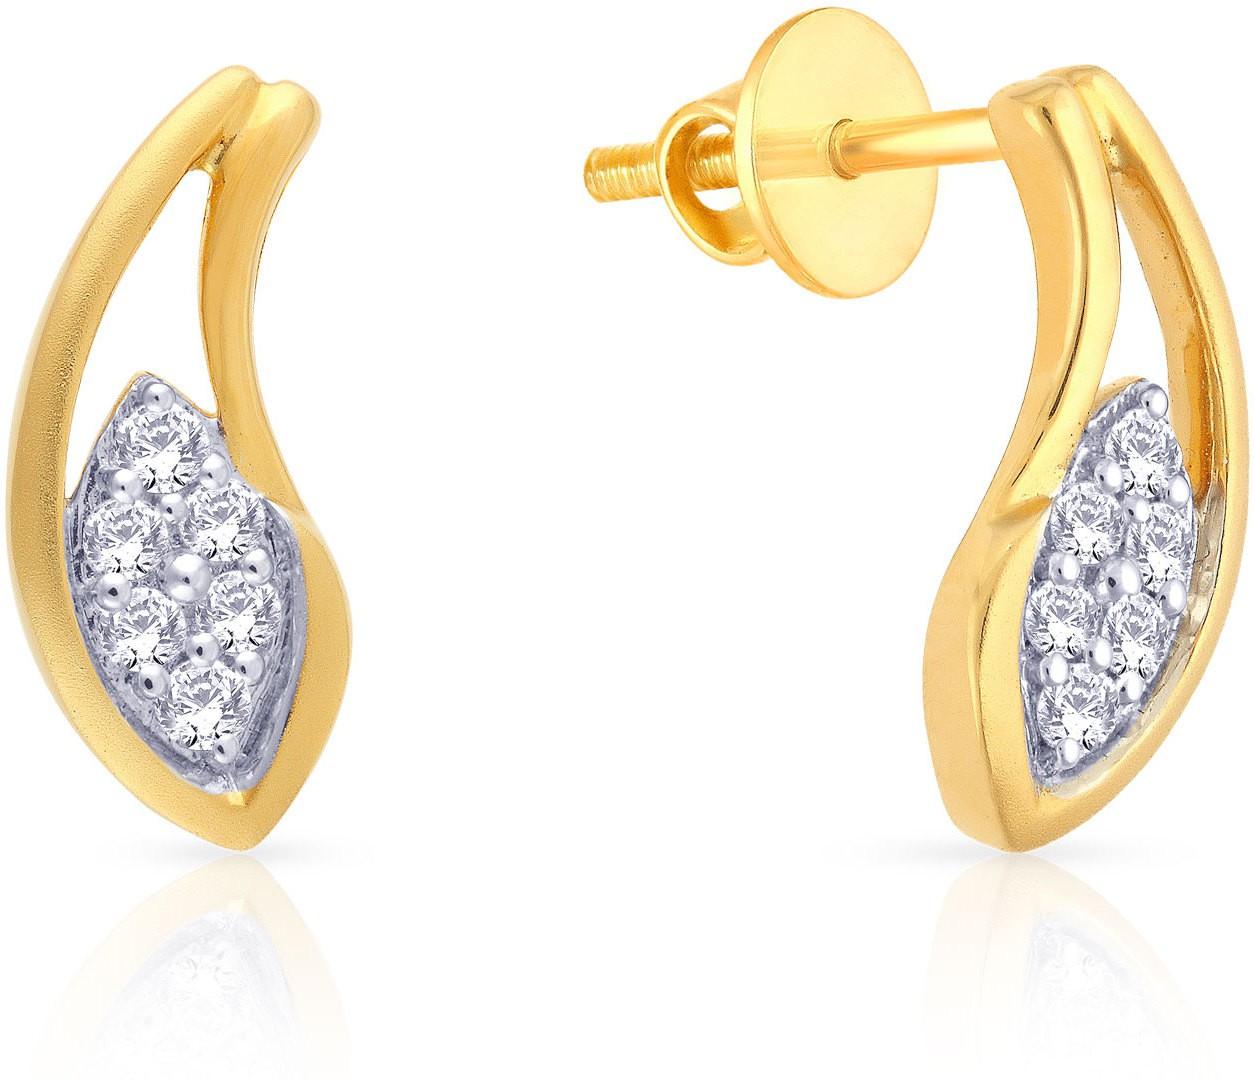 7991e1fcdcd64 Malabar Gold and Diamonds E72789 Yellow Gold 18kt Diamond Stud Earring